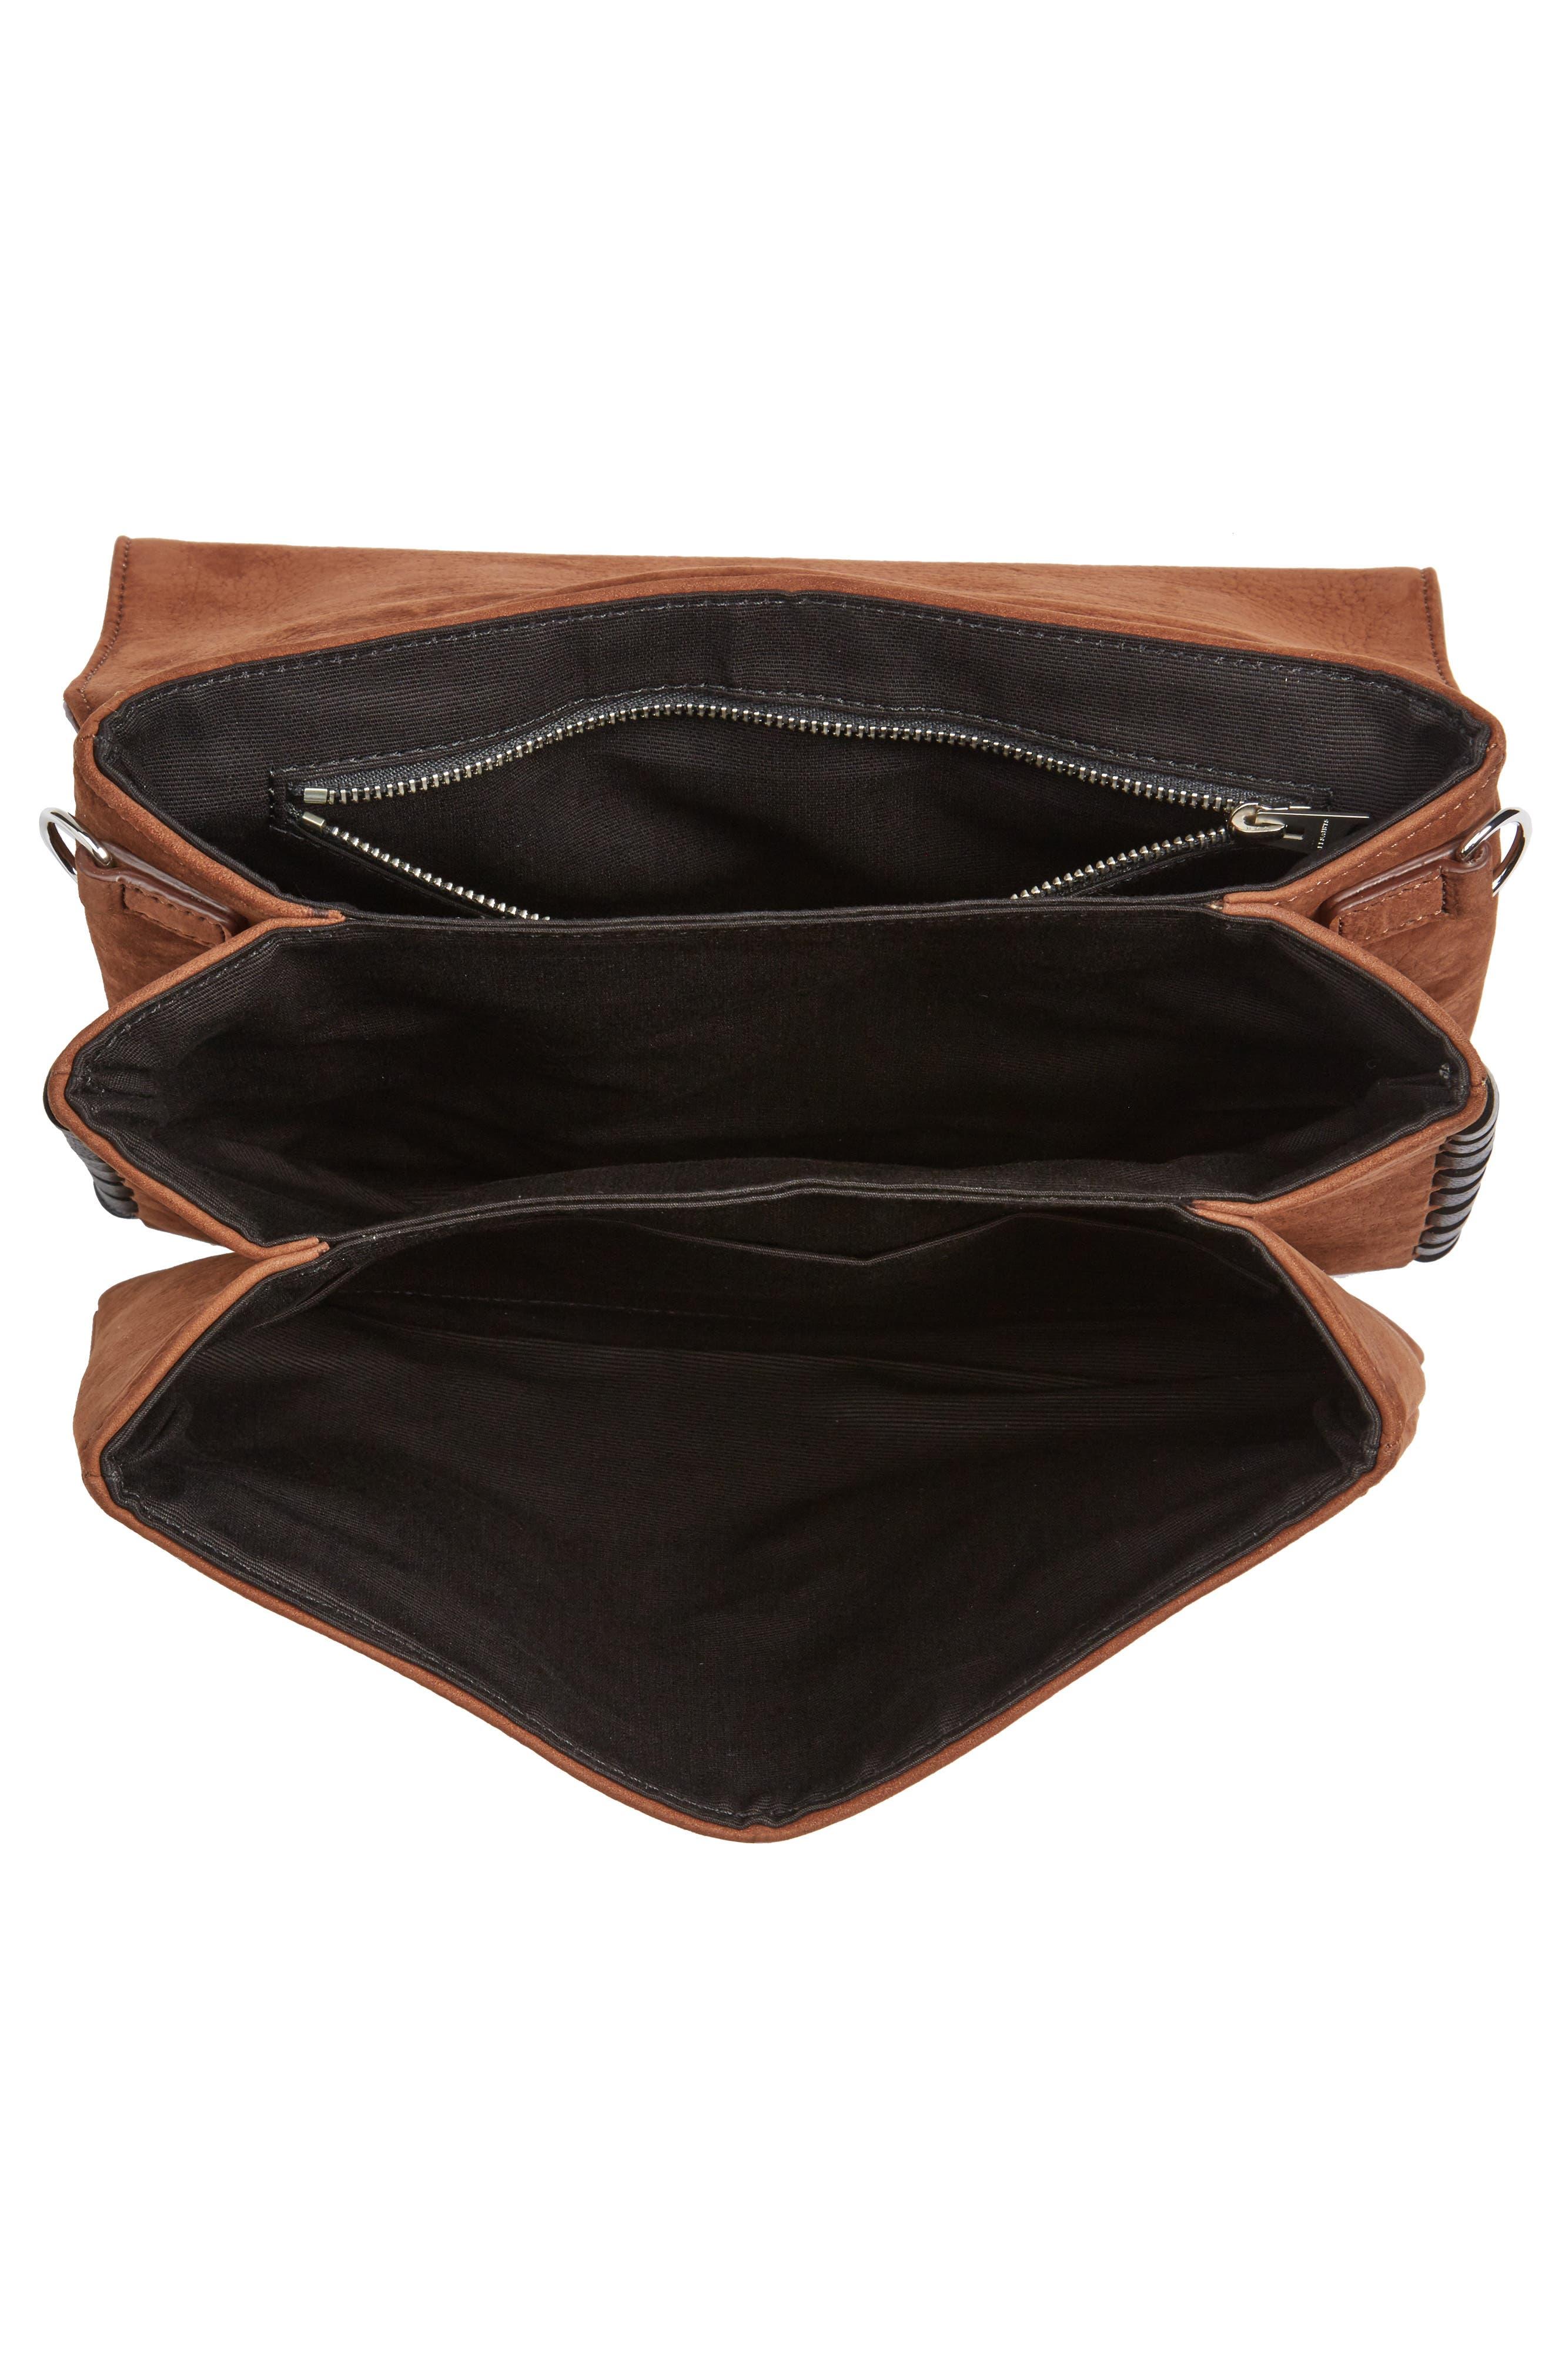 Fin Leather Box Bag,                             Alternate thumbnail 4, color,                             200